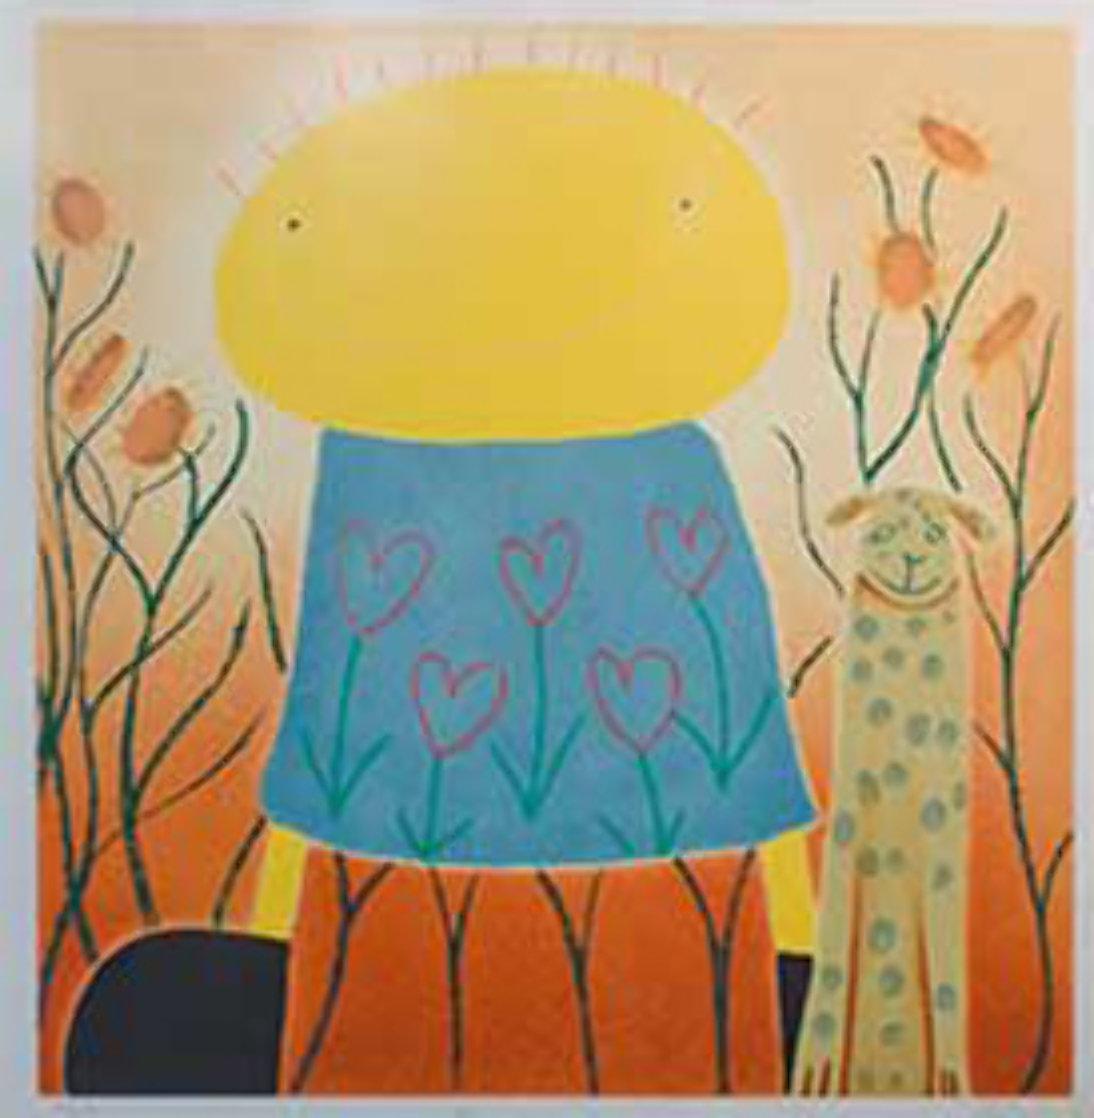 Secret Garden Limited Edition Print by Mackenzie Thorpe